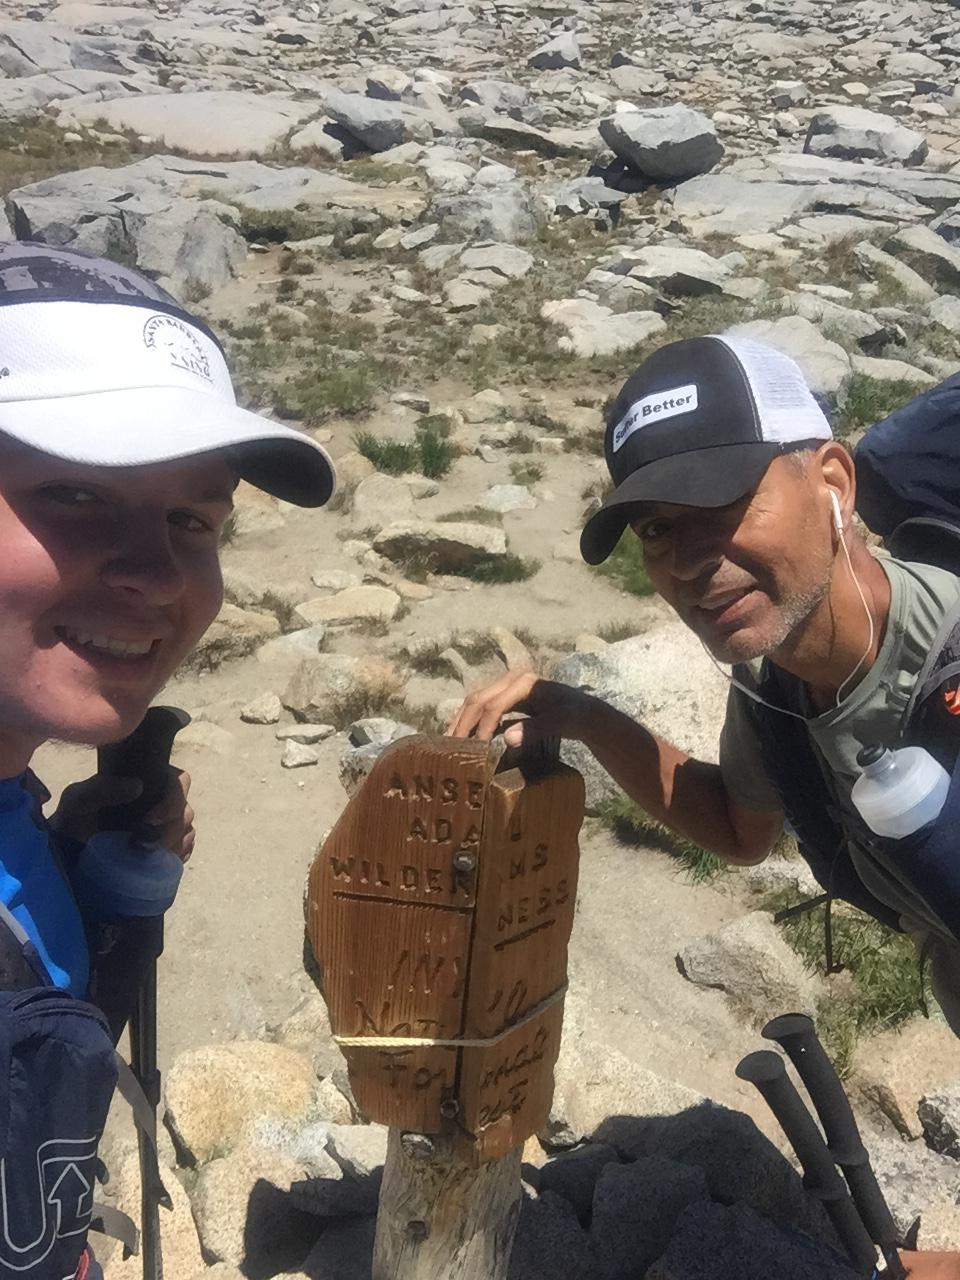 Yosemite-Ansel Adams Wilderness/Inyo Border